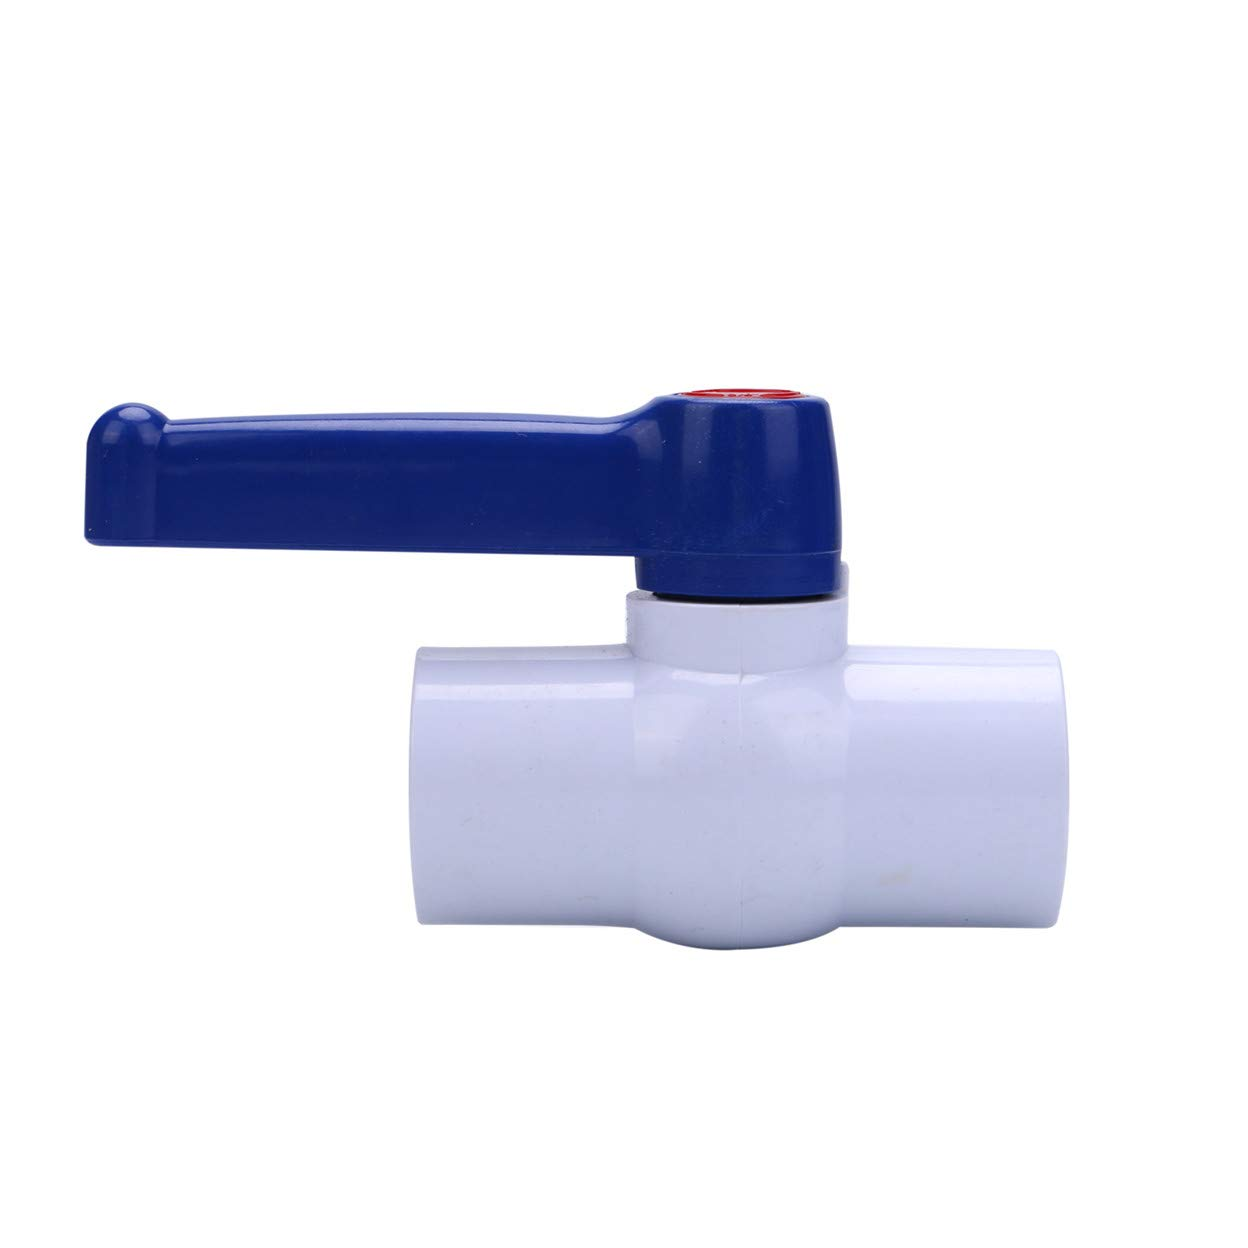 SHMONO 3//4 Inline PVC Ball Valve Female Thread x Female Thread Water Shut-Off Valves 2 Pack